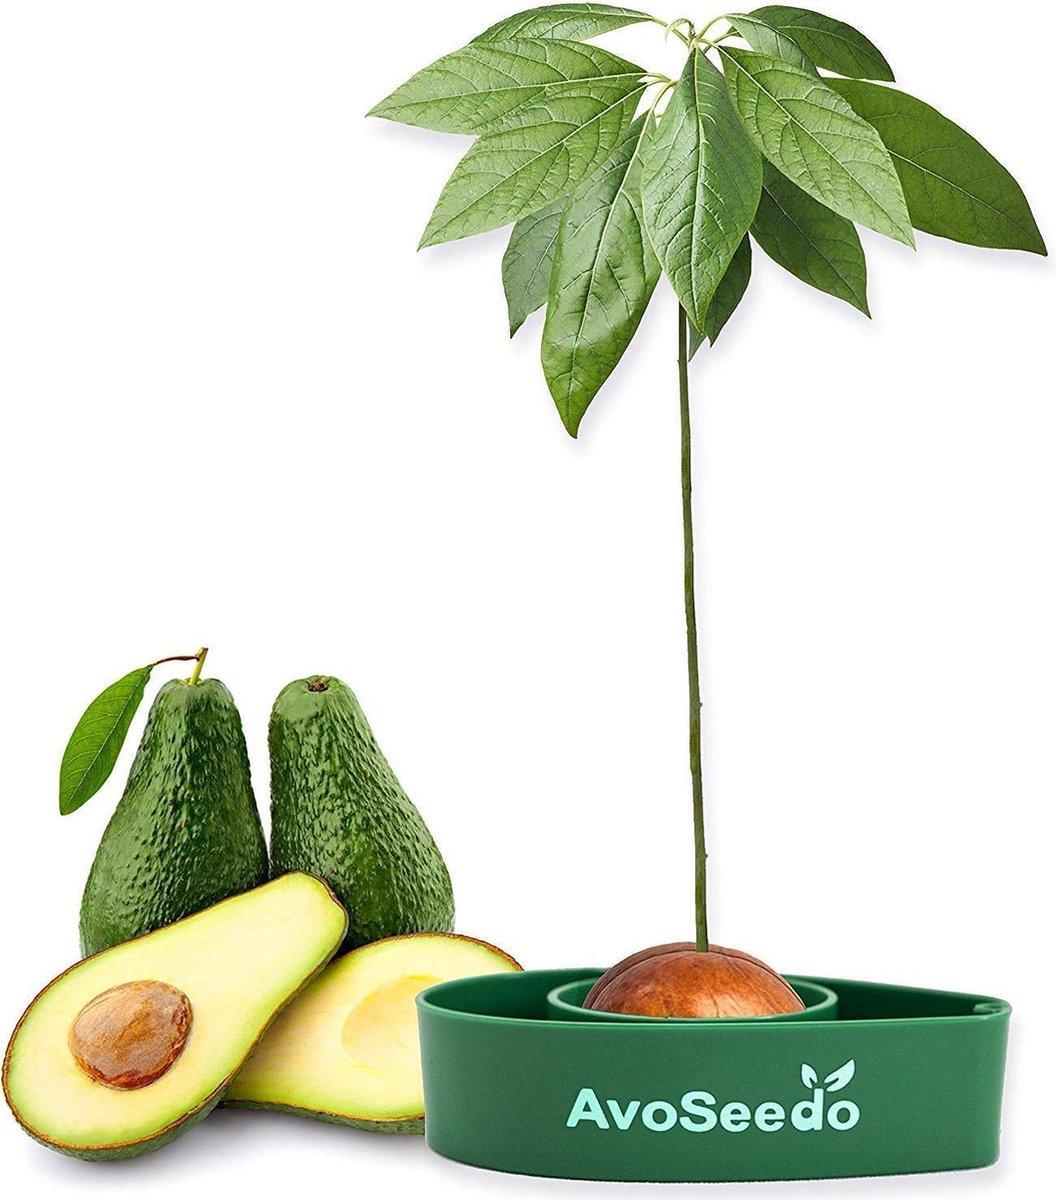 AvoSeedo - Avocado Boom - Kweek Kit - Praktische Tuinier Cadeau - Avocado Lovers